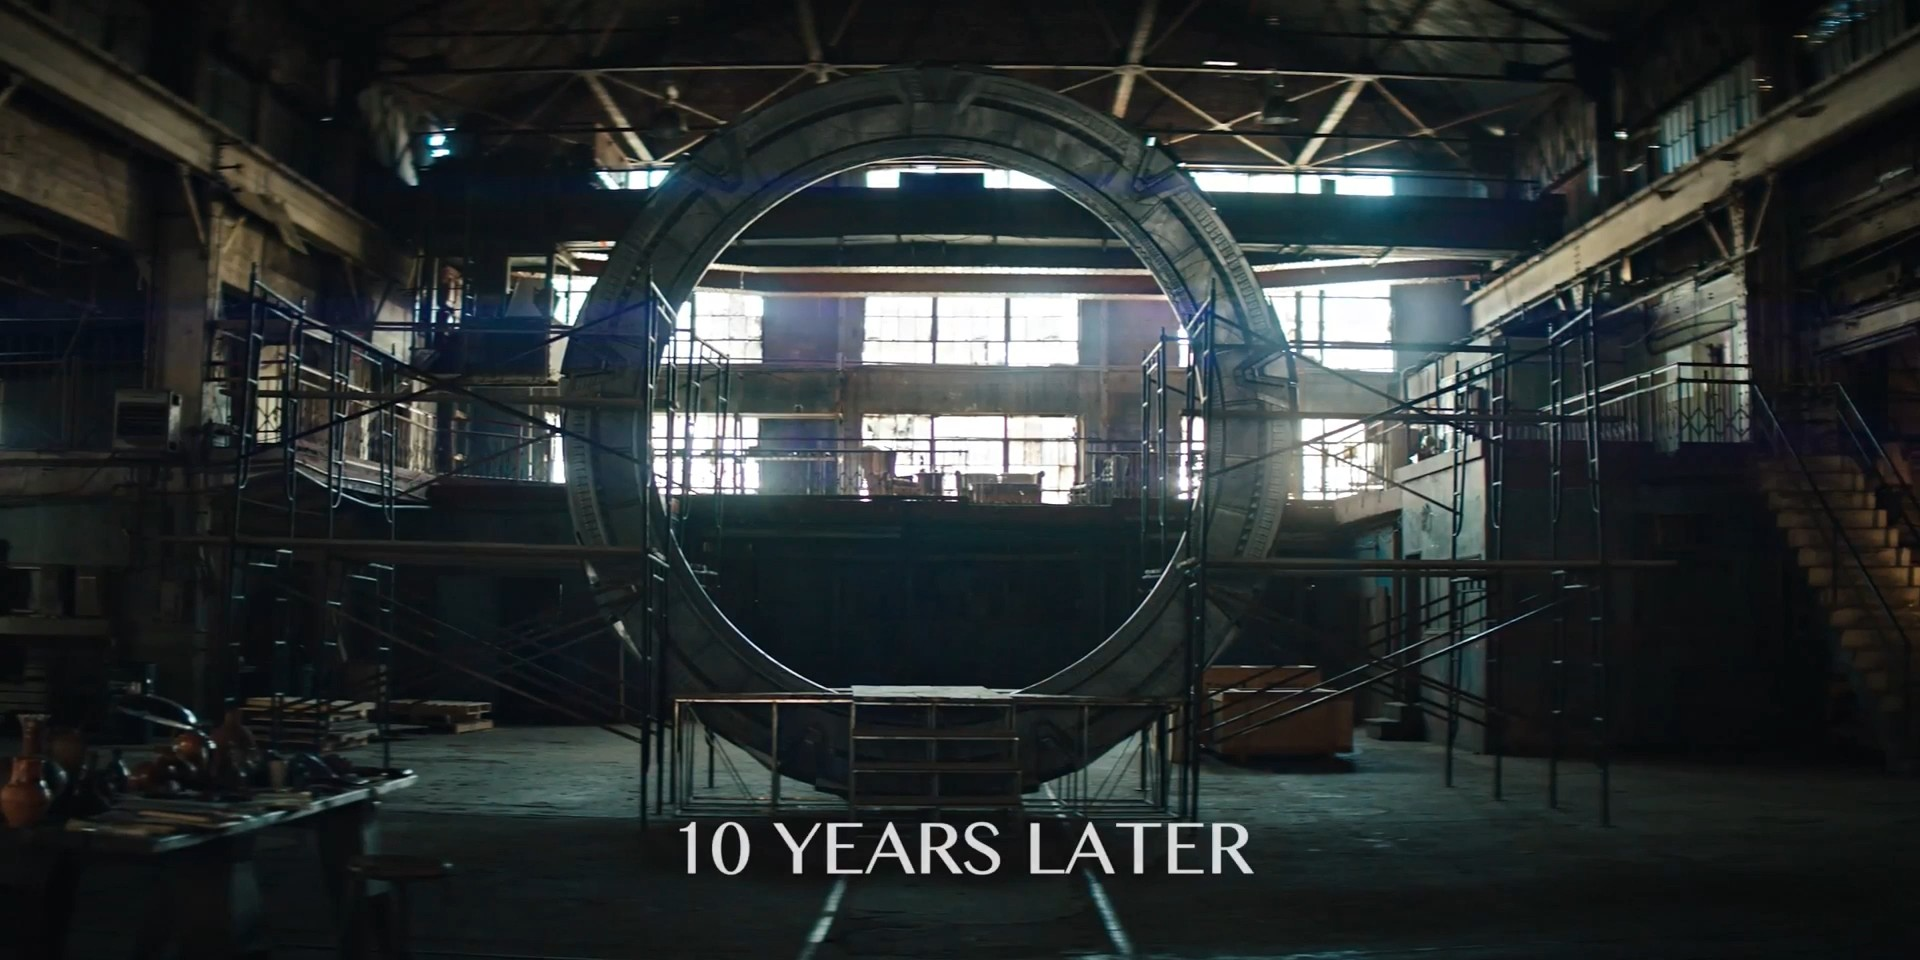 Звездные врата: Начало / Stargate Origins [01x01-07 из 10] (2017) WEB-DLRip 1080p